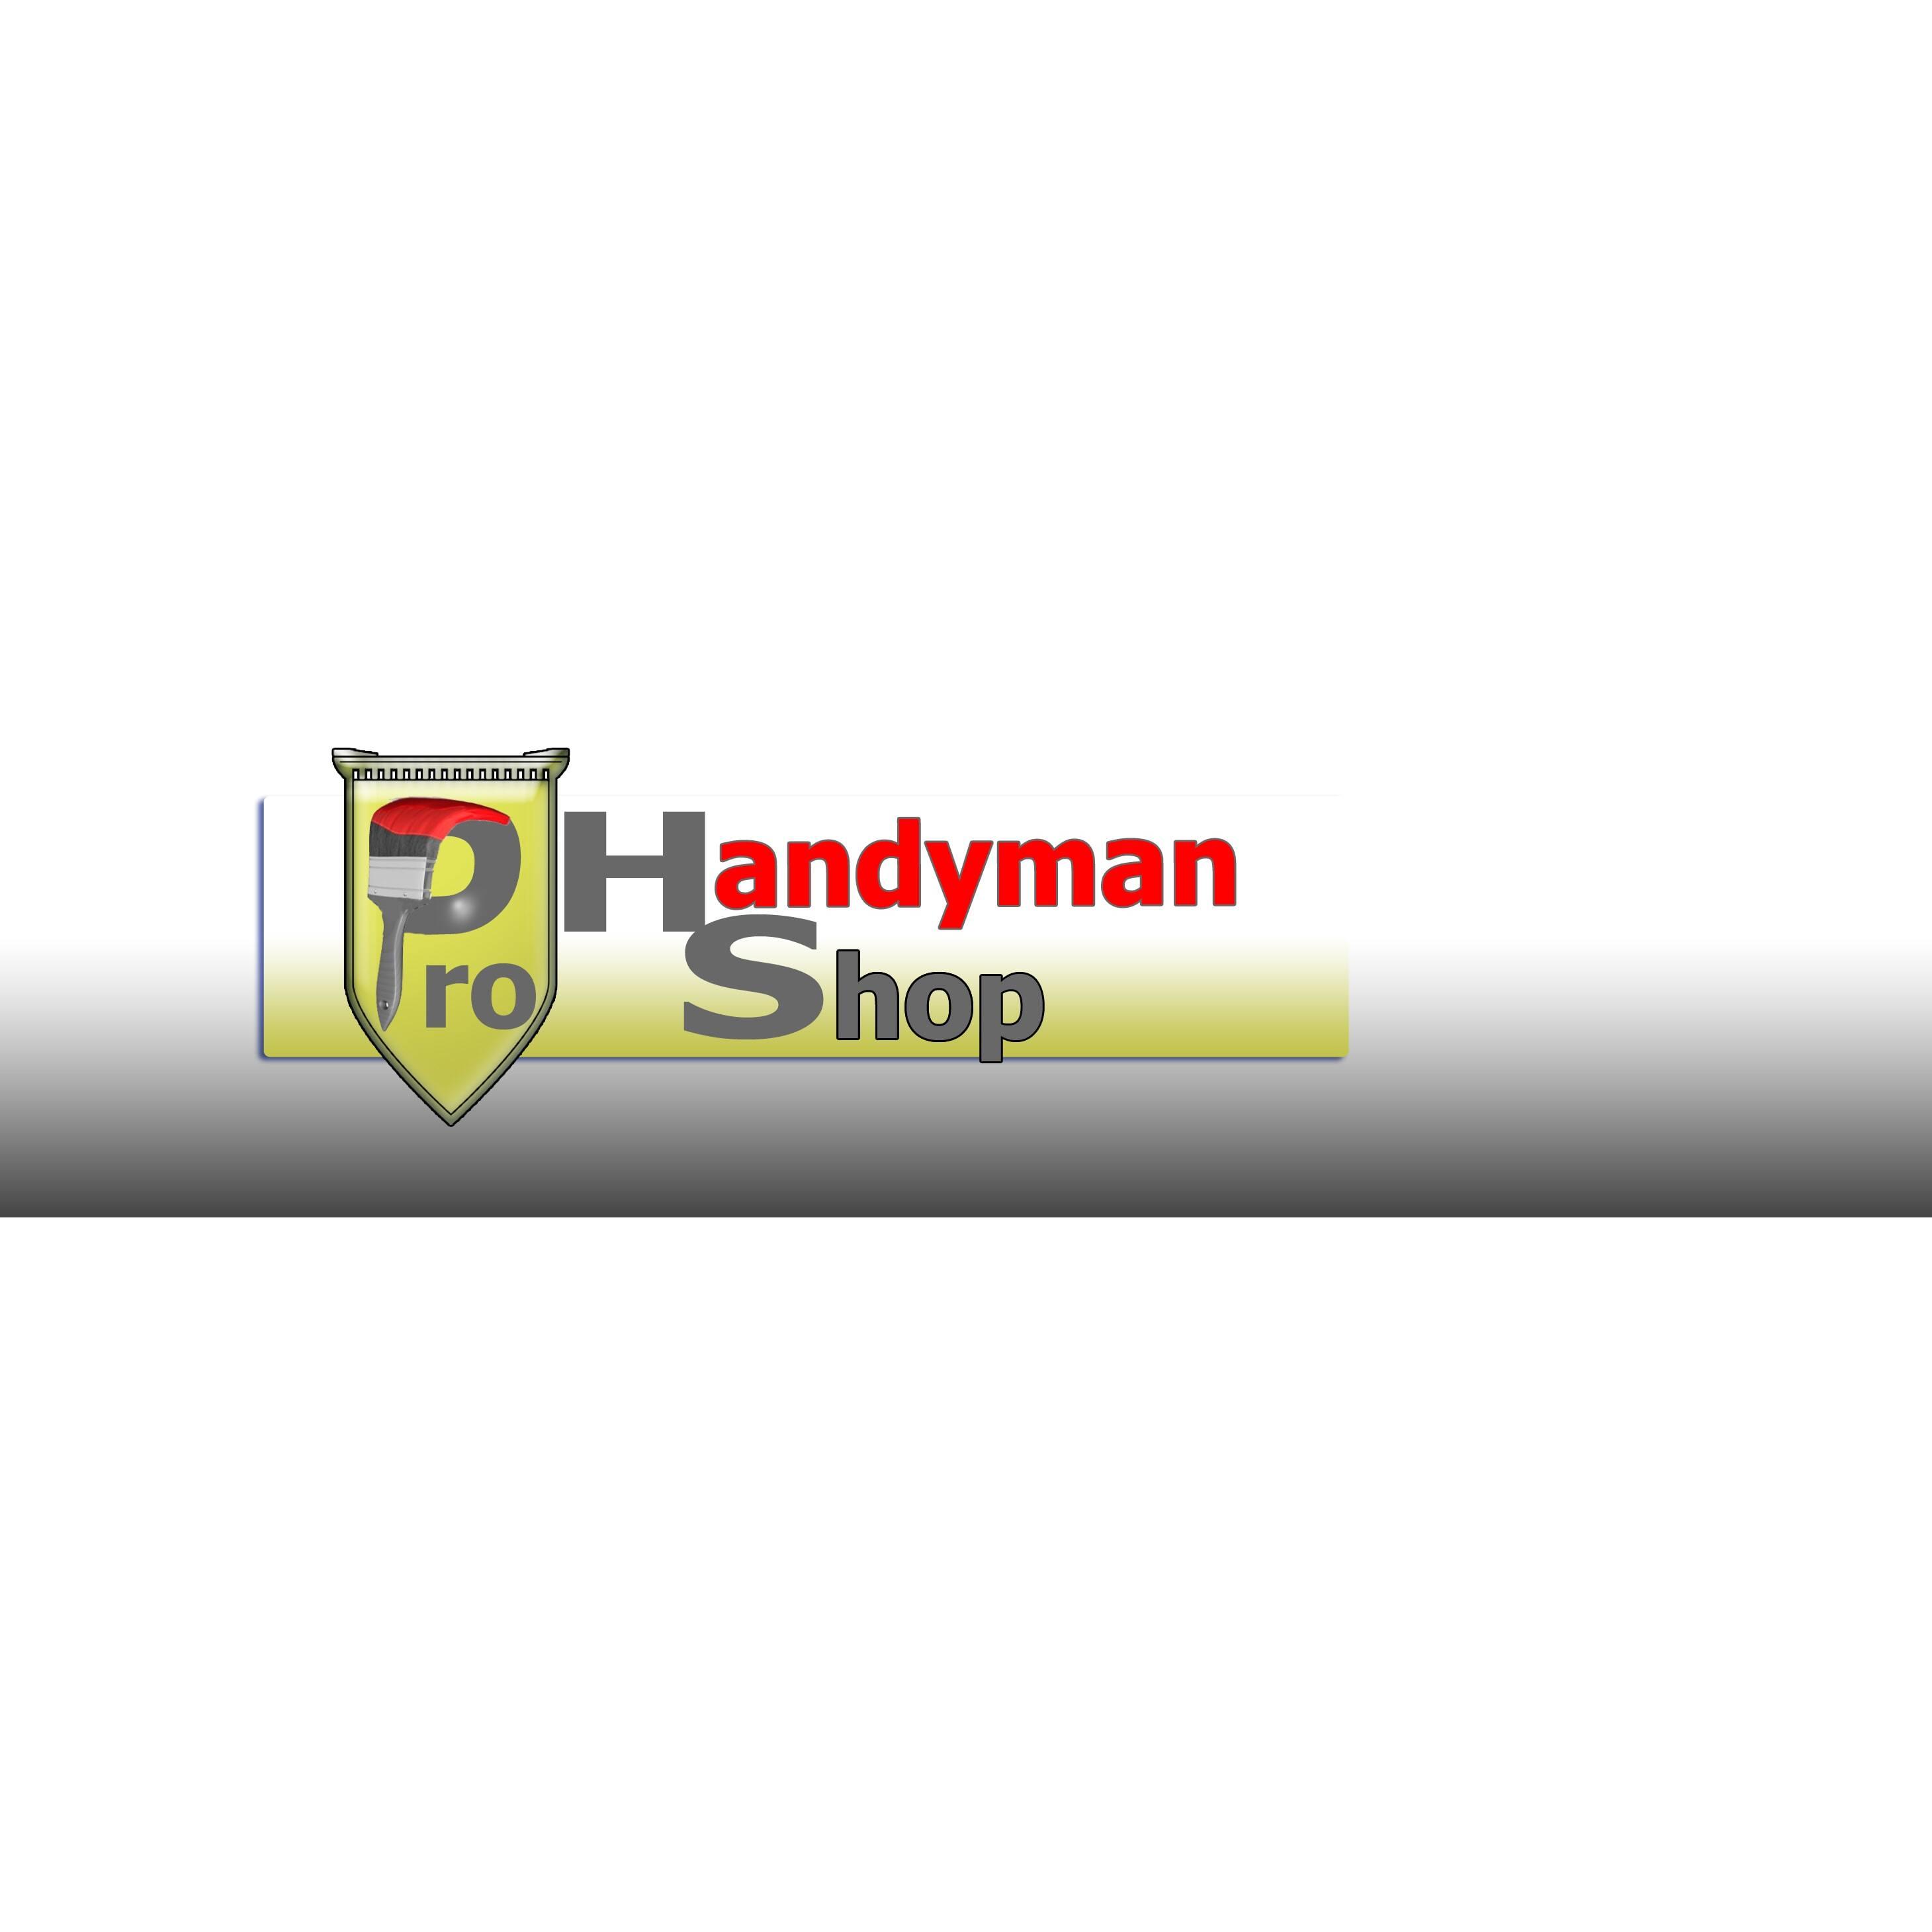 Pro Handyman Shop